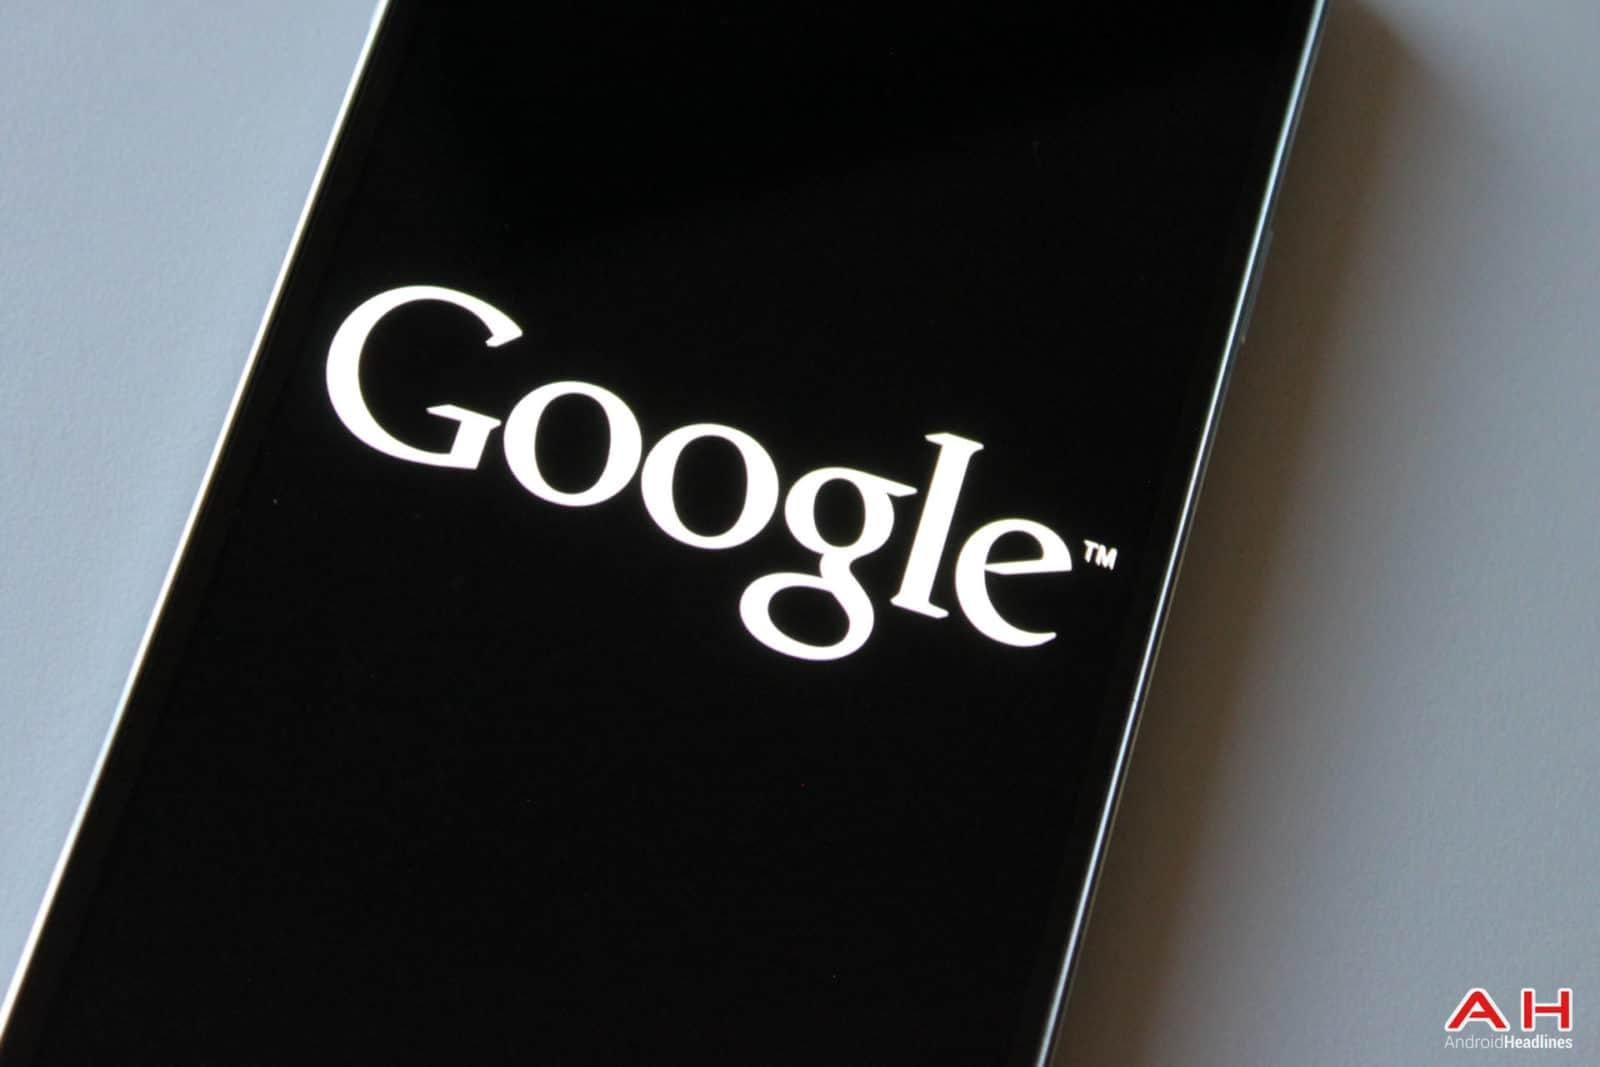 AH Google Logo Black 1.4